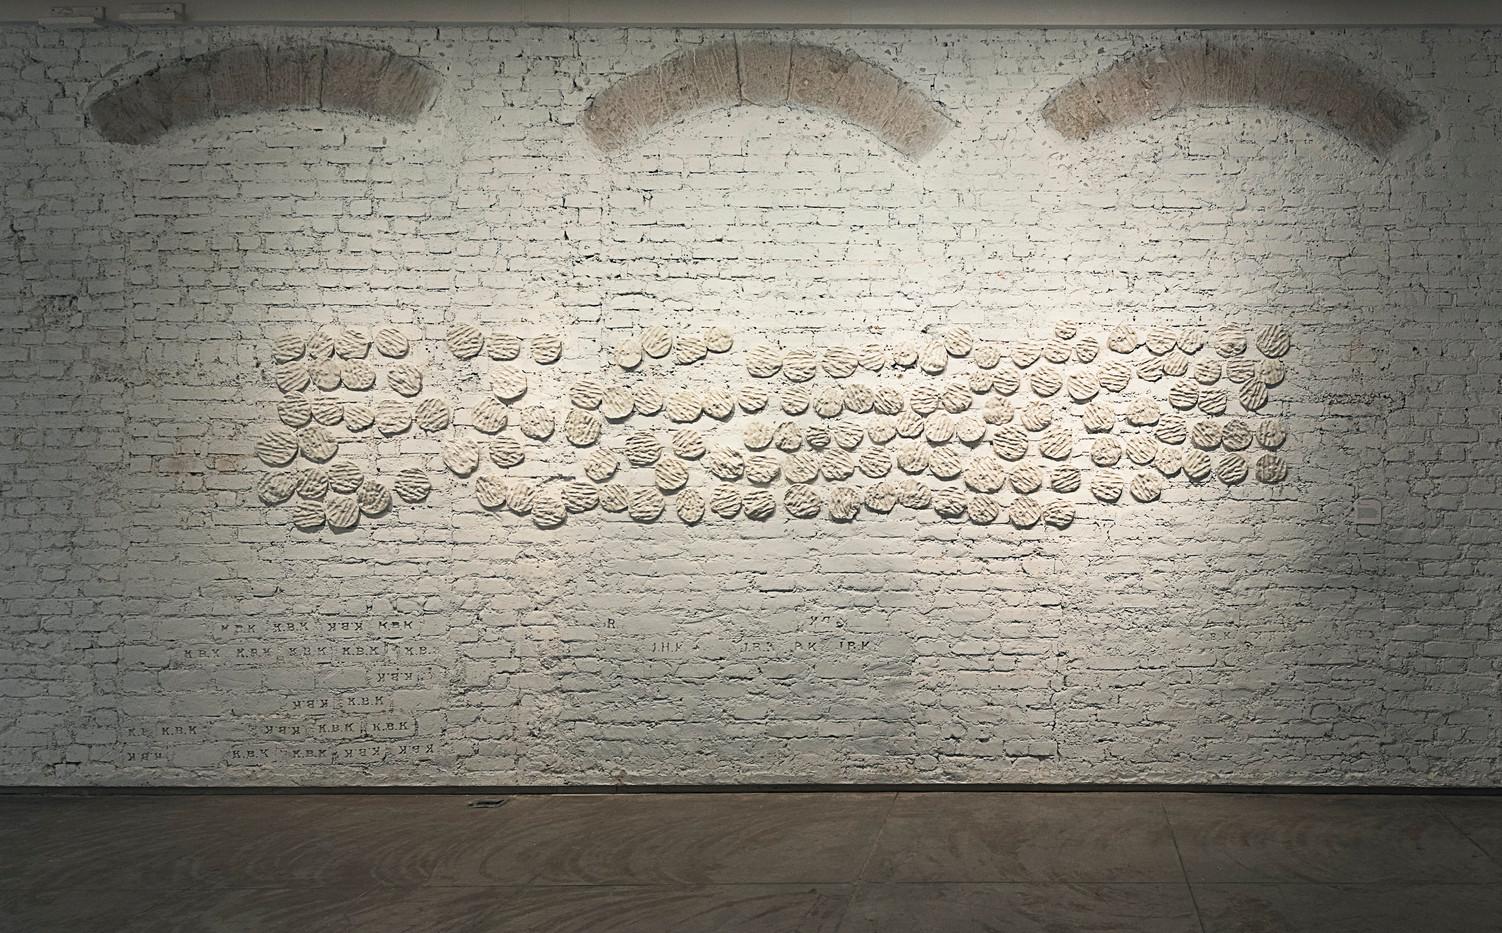 Upla, Mapping memory, Gallery Chemould, Mumbai